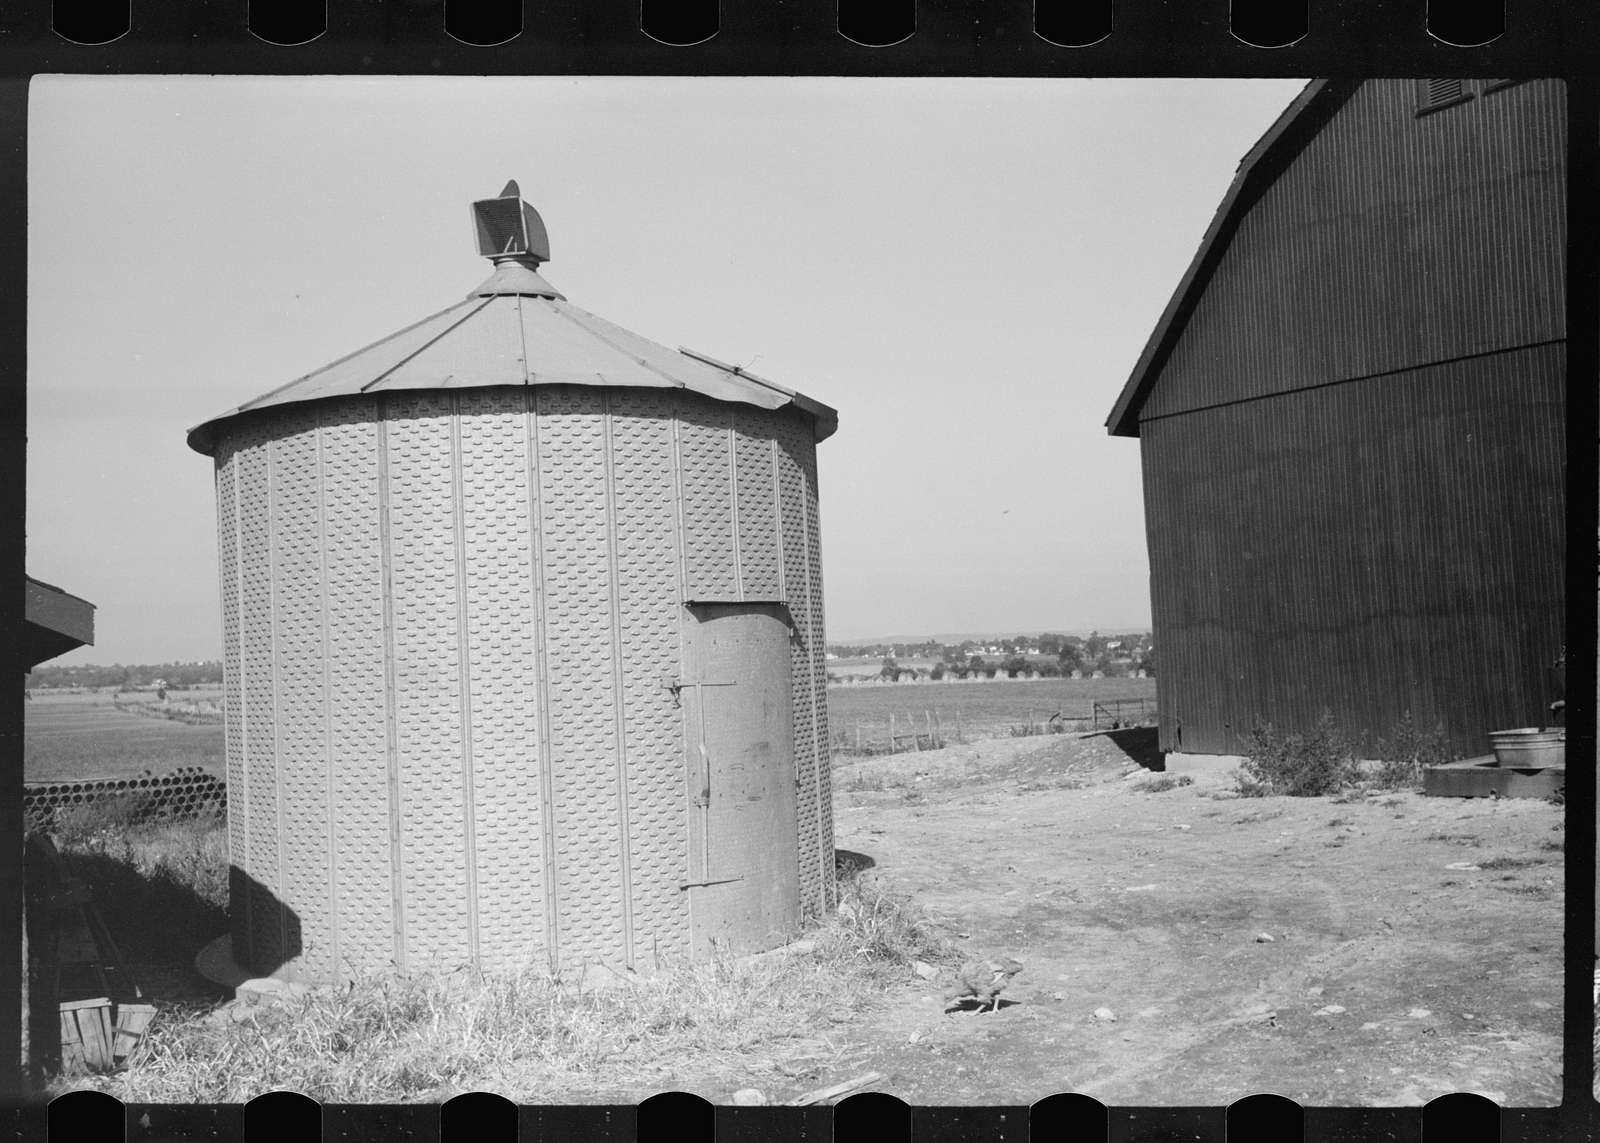 Farmers of Great Depression. Dust bowl refugees, Resettlement program.